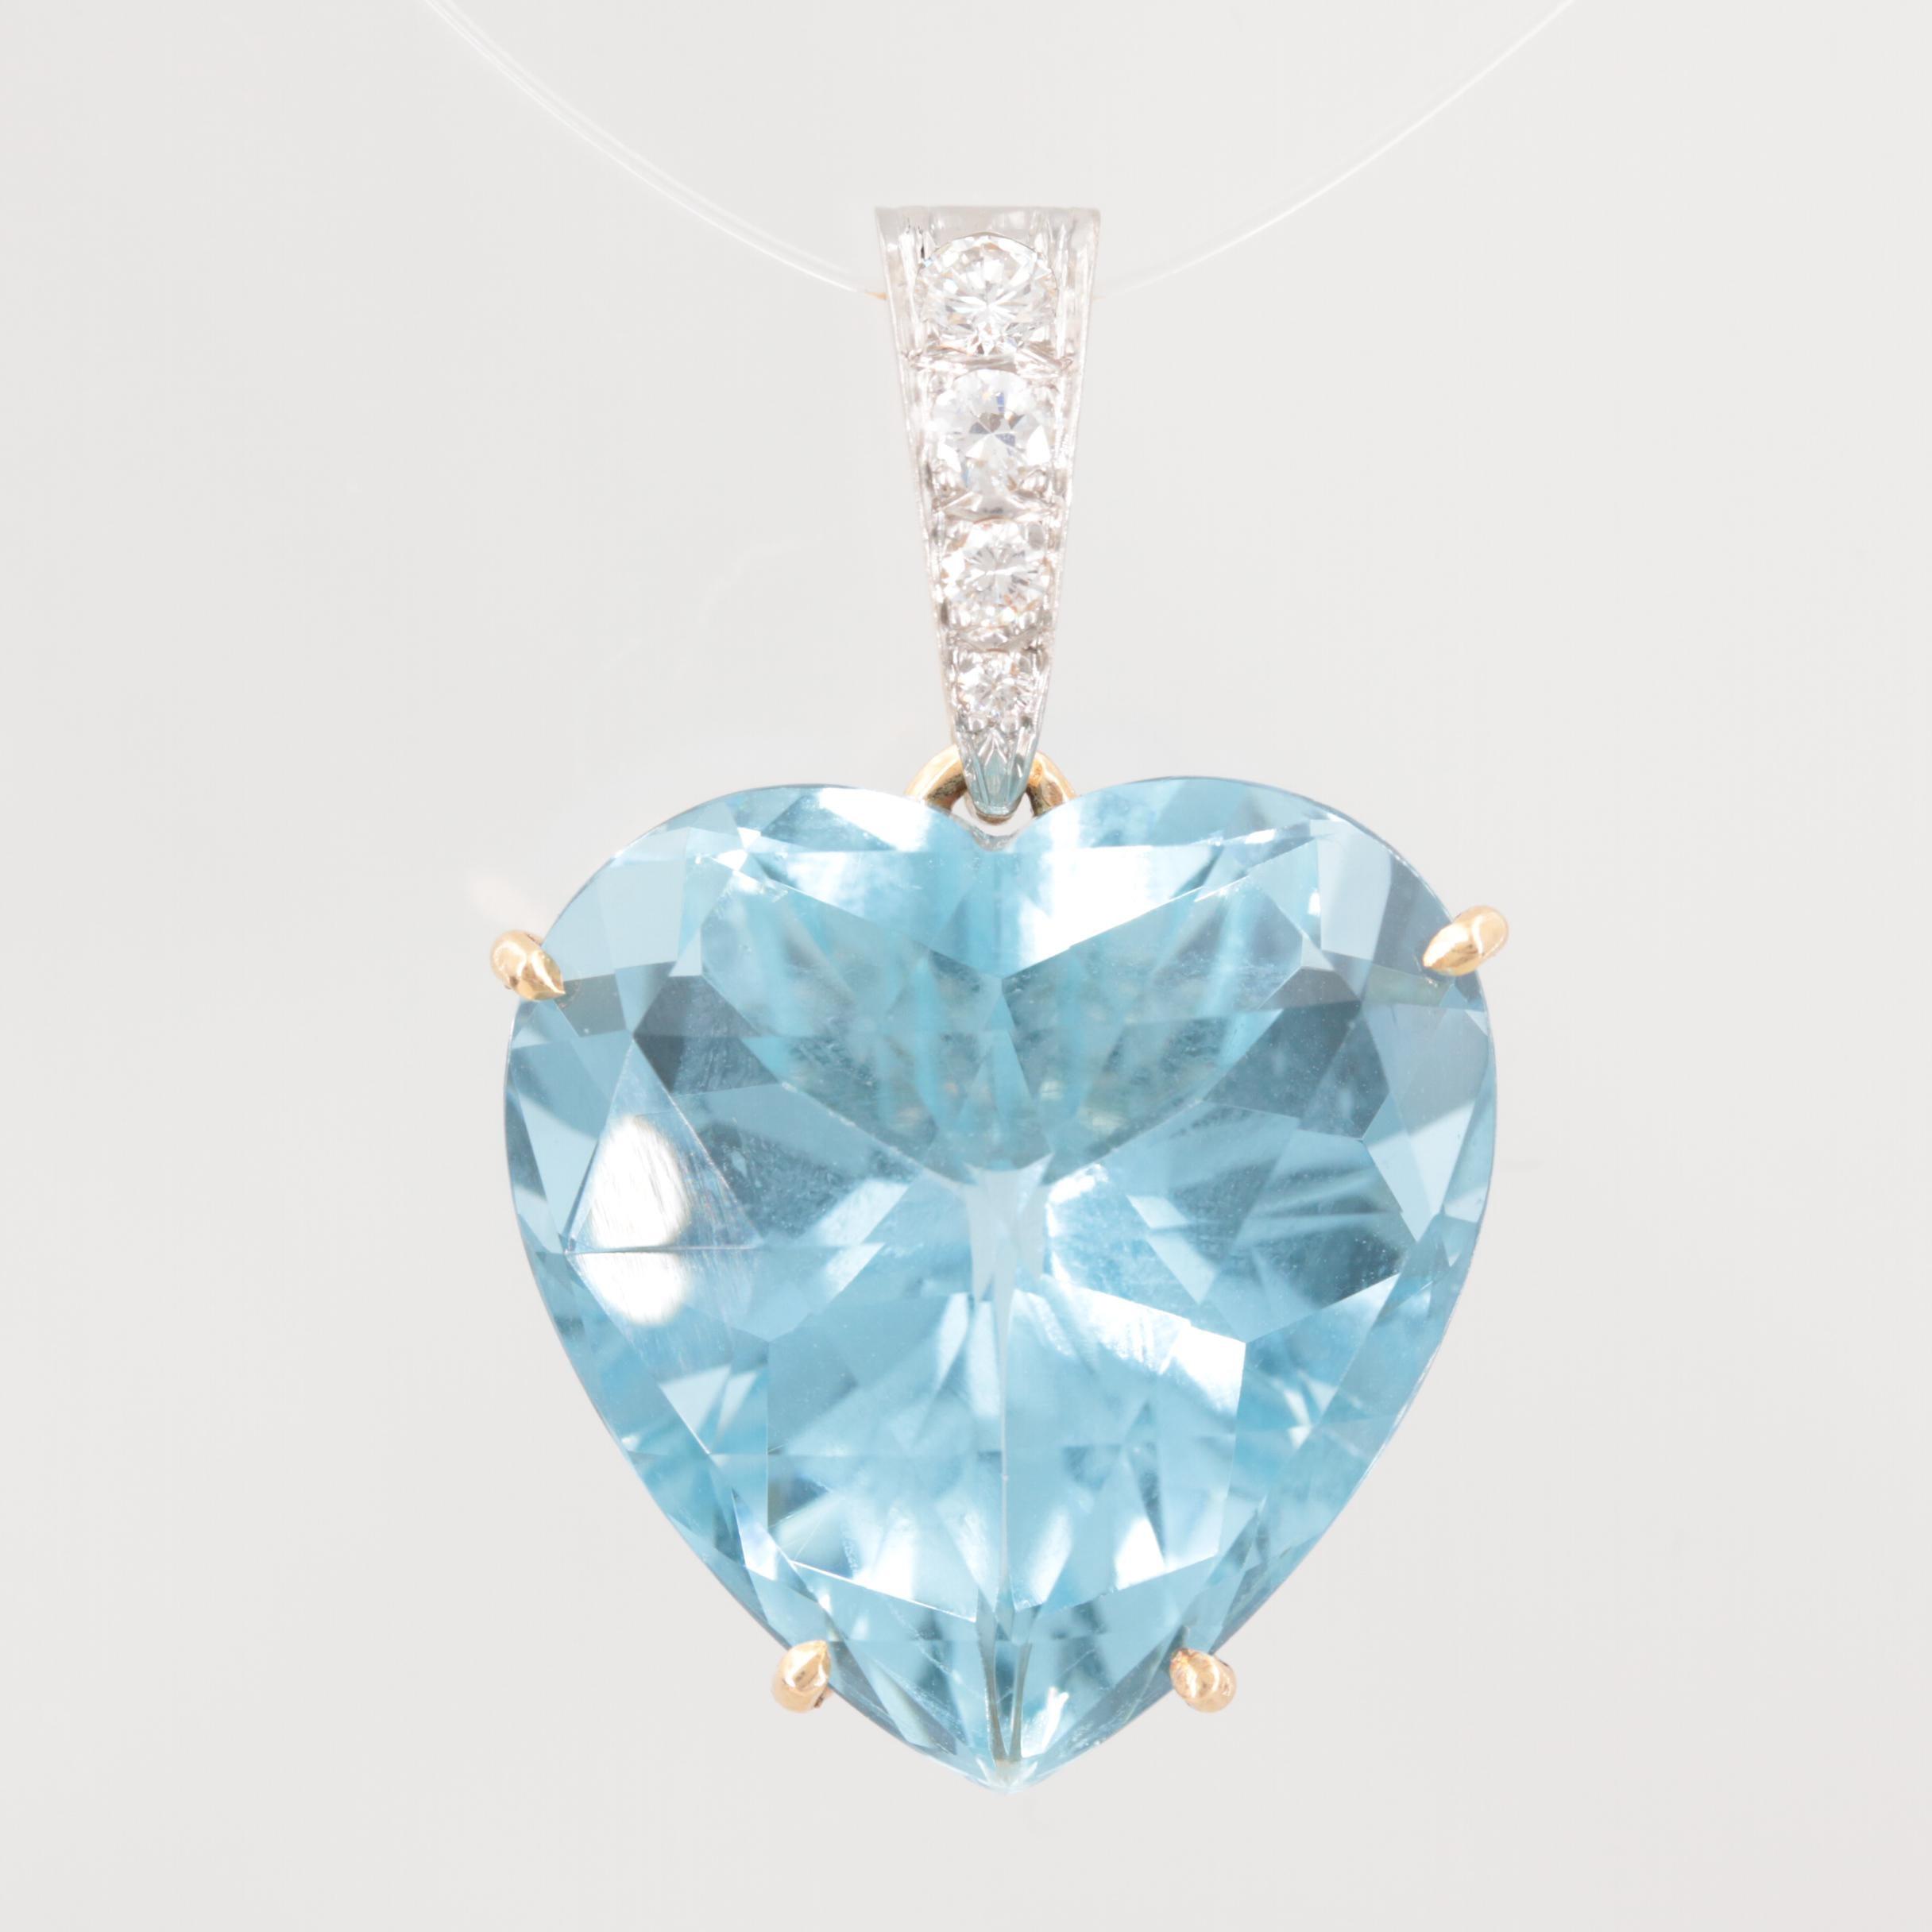 14K Yellow Gold and Platinum 32.92 CT Aquamarine and Diamond Heart Pendant